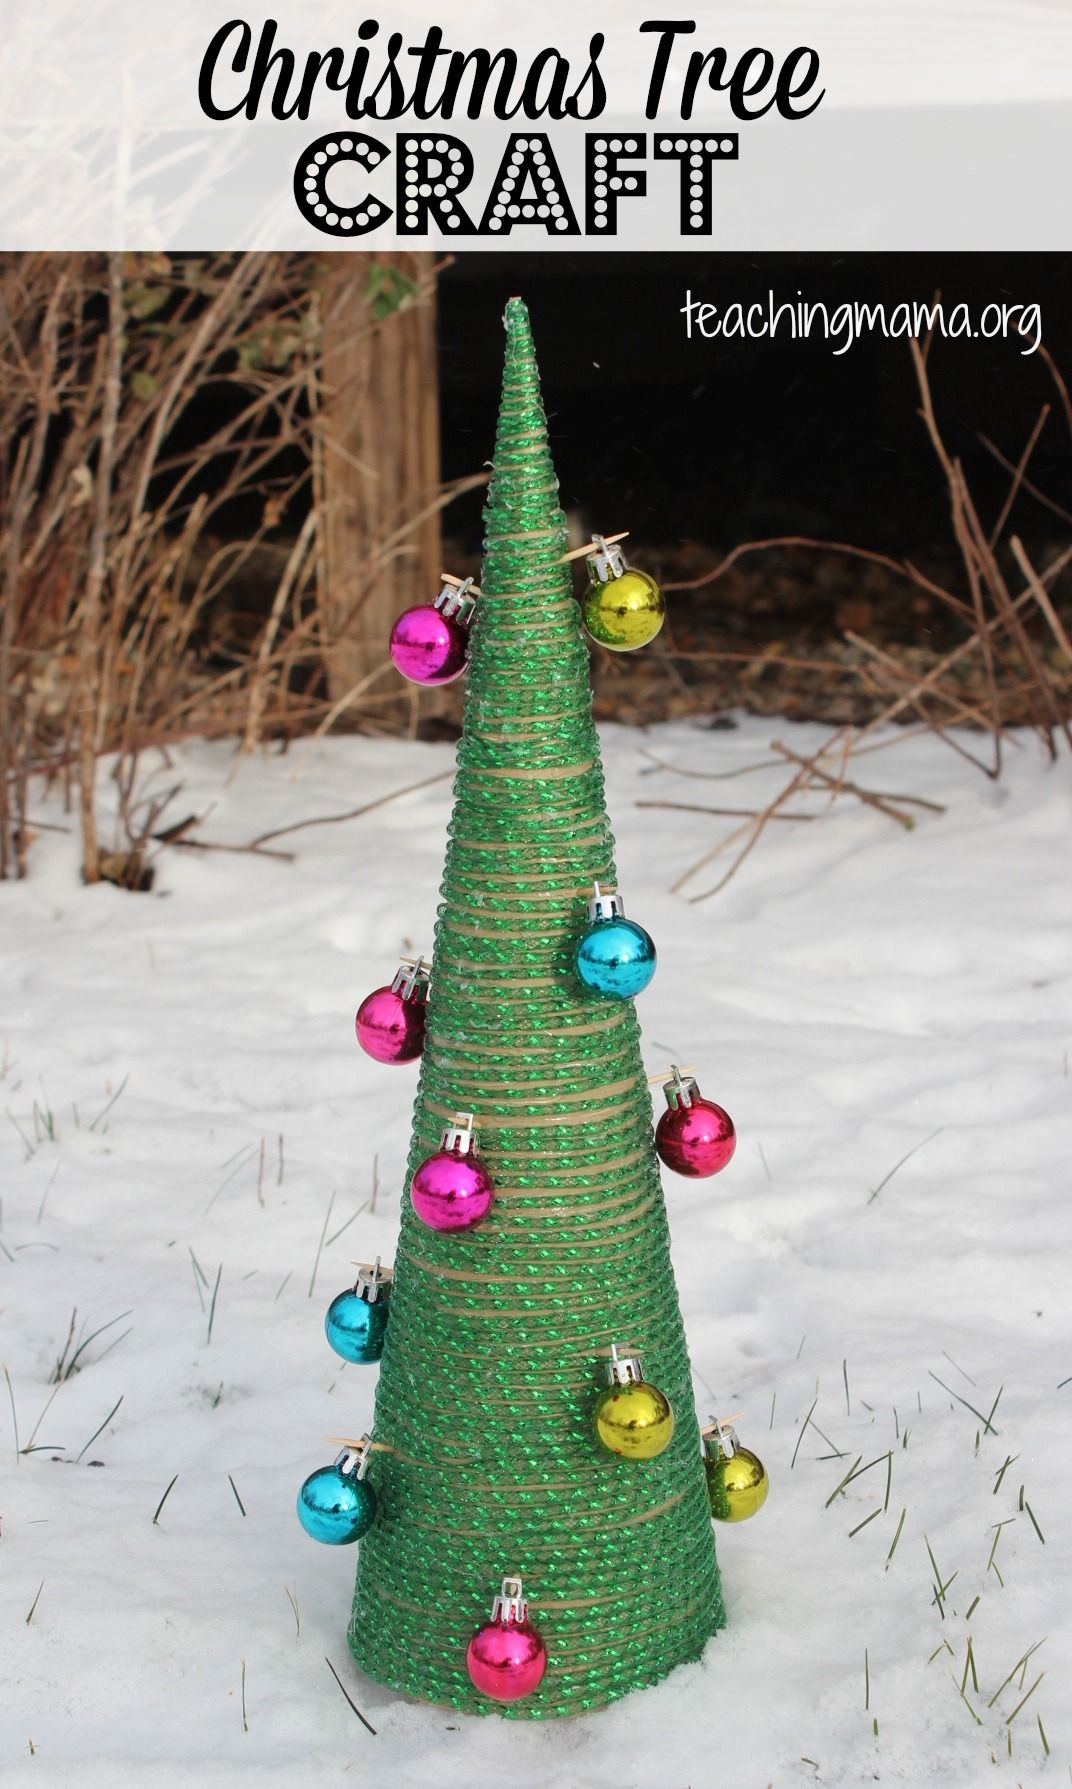 Christmas Tree Craft Christmas Tree Crafts Tree Crafts Diy Christmas Tree Ornaments